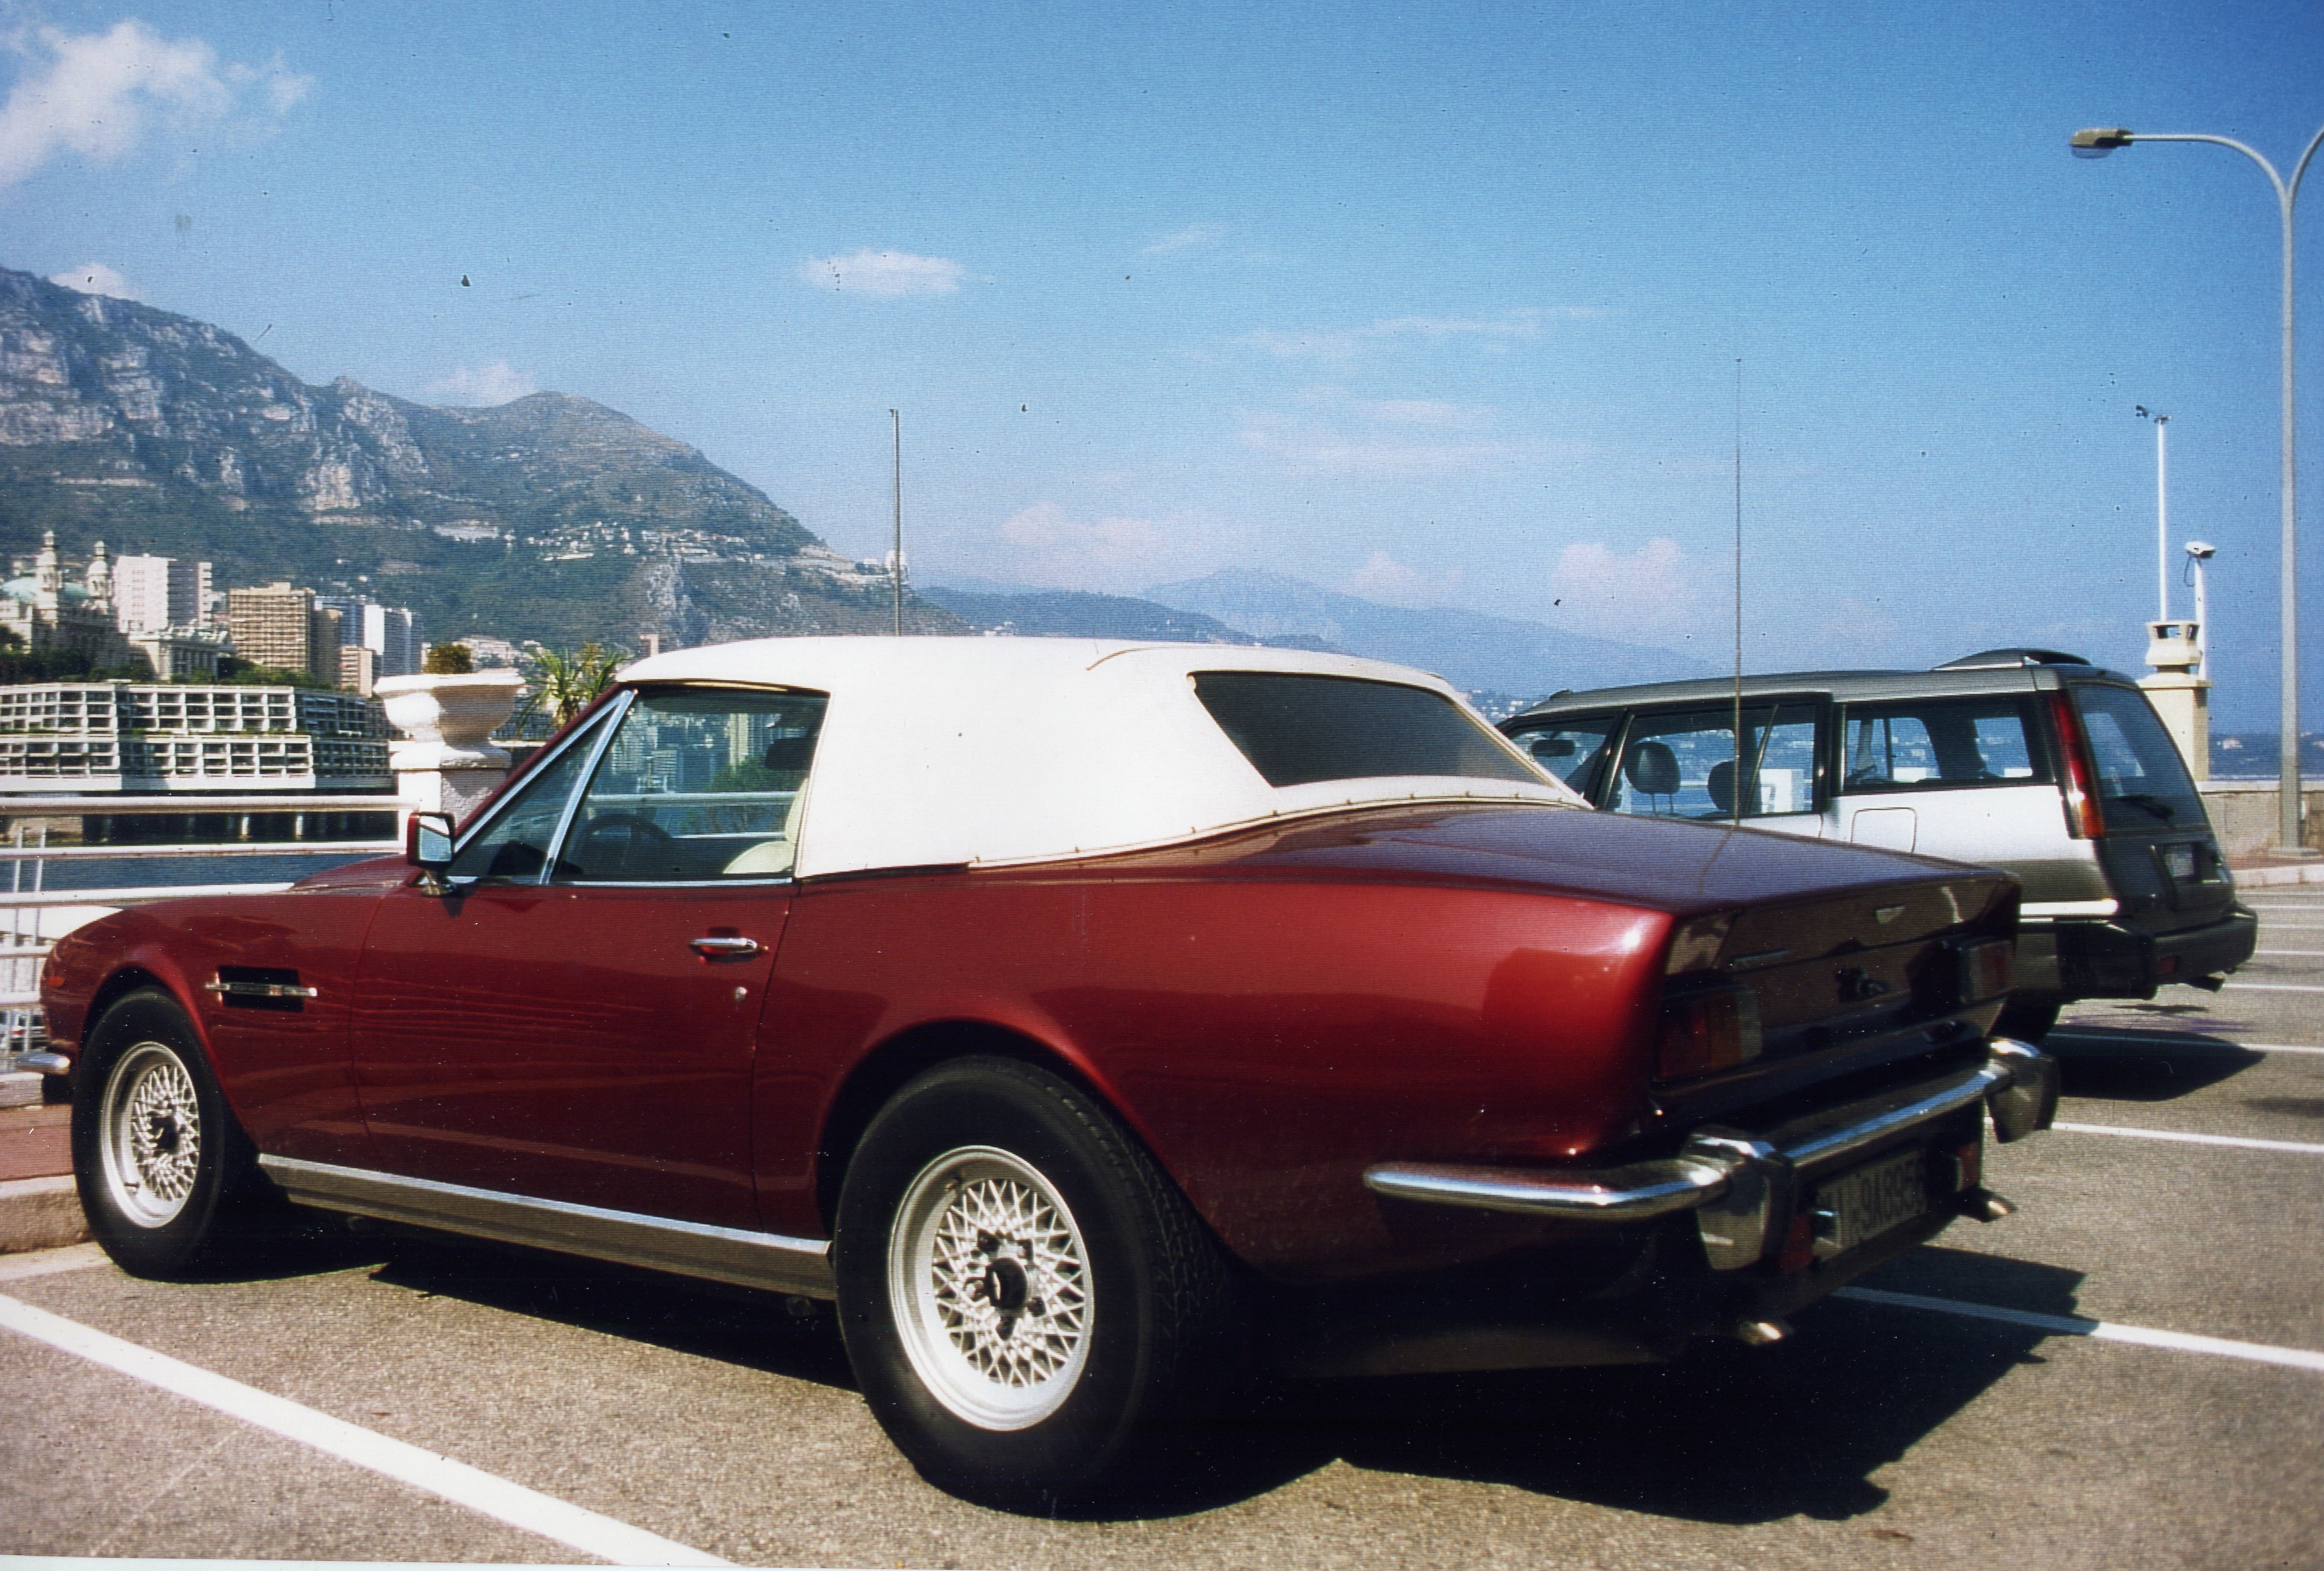 Aston Martin V8 Volante in Fontvielle, Monaco.jpg